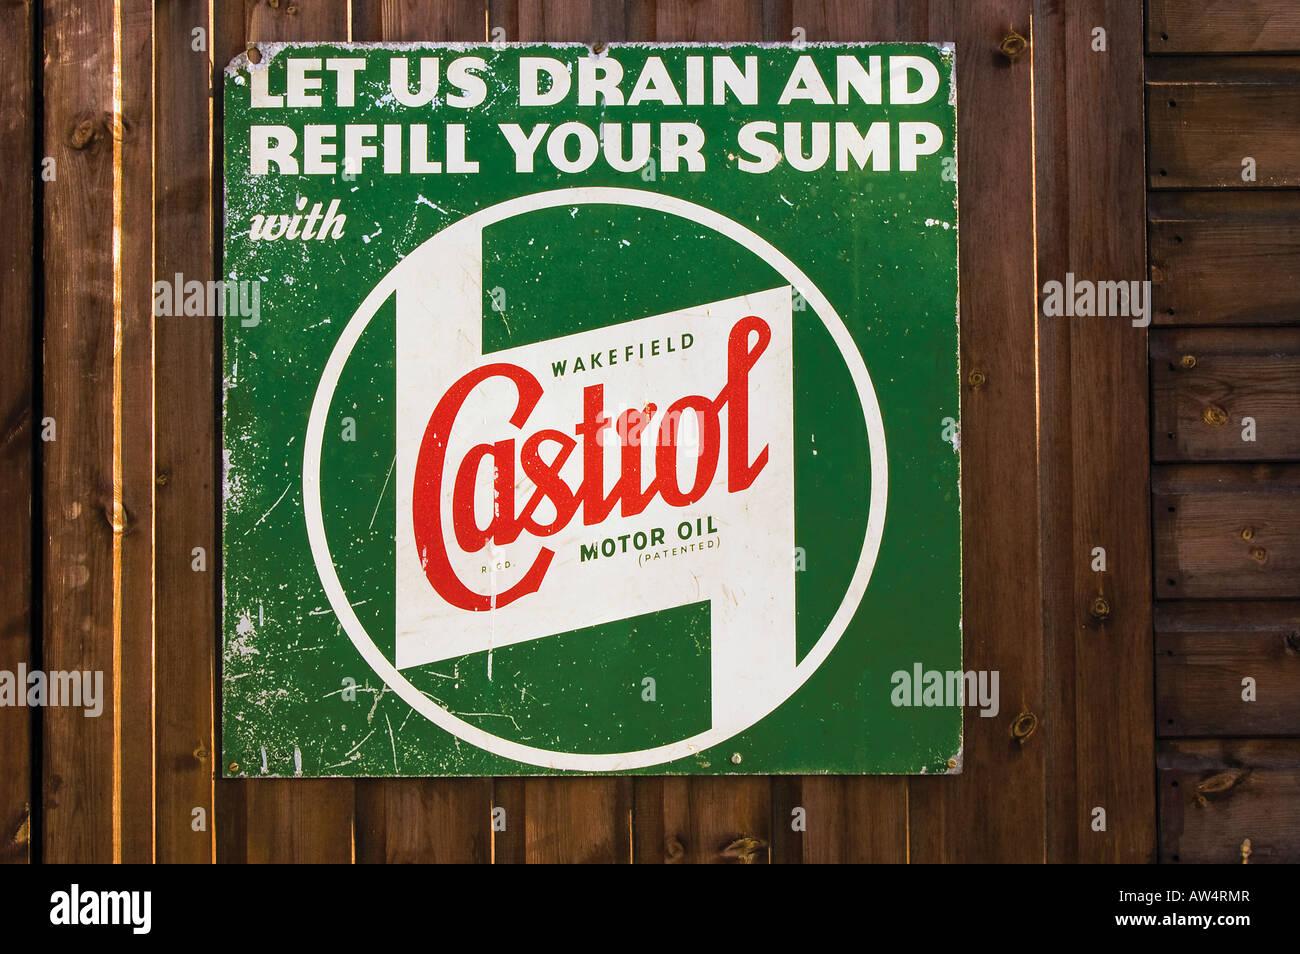 Castrol Motor Oil Sign Castrol GTX Oil Castrol Lubricants Garage Shop Tin Sign